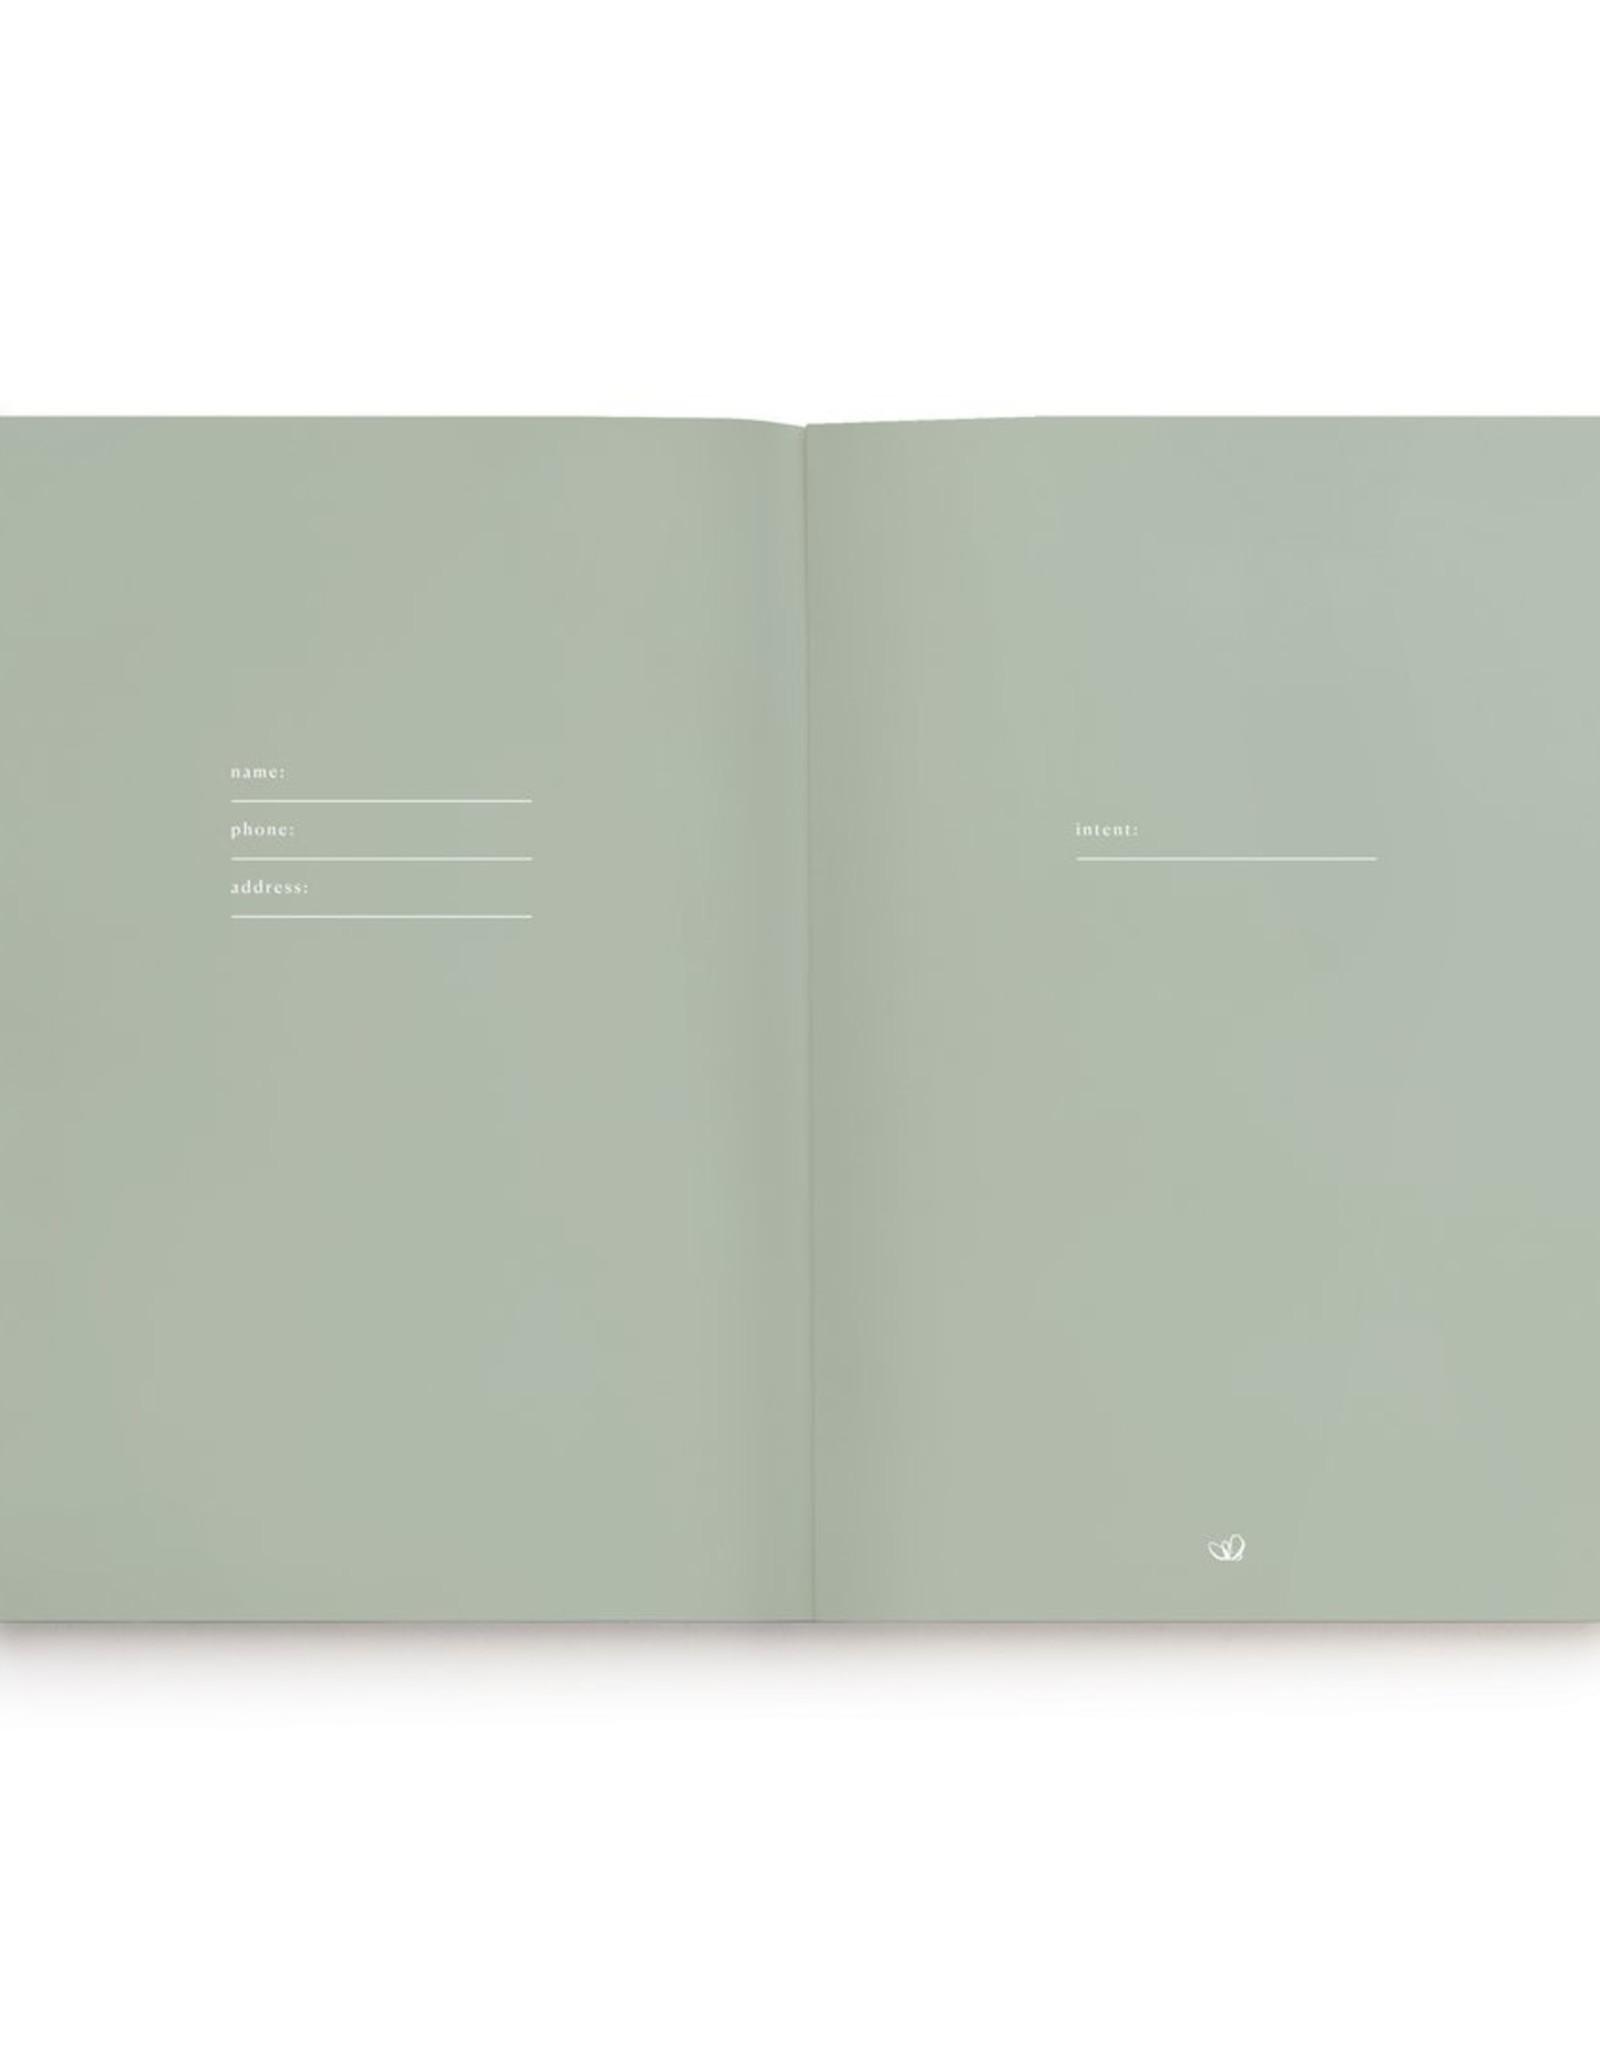 Our Heiday Our Heiday | Honey Dot Grid Journal